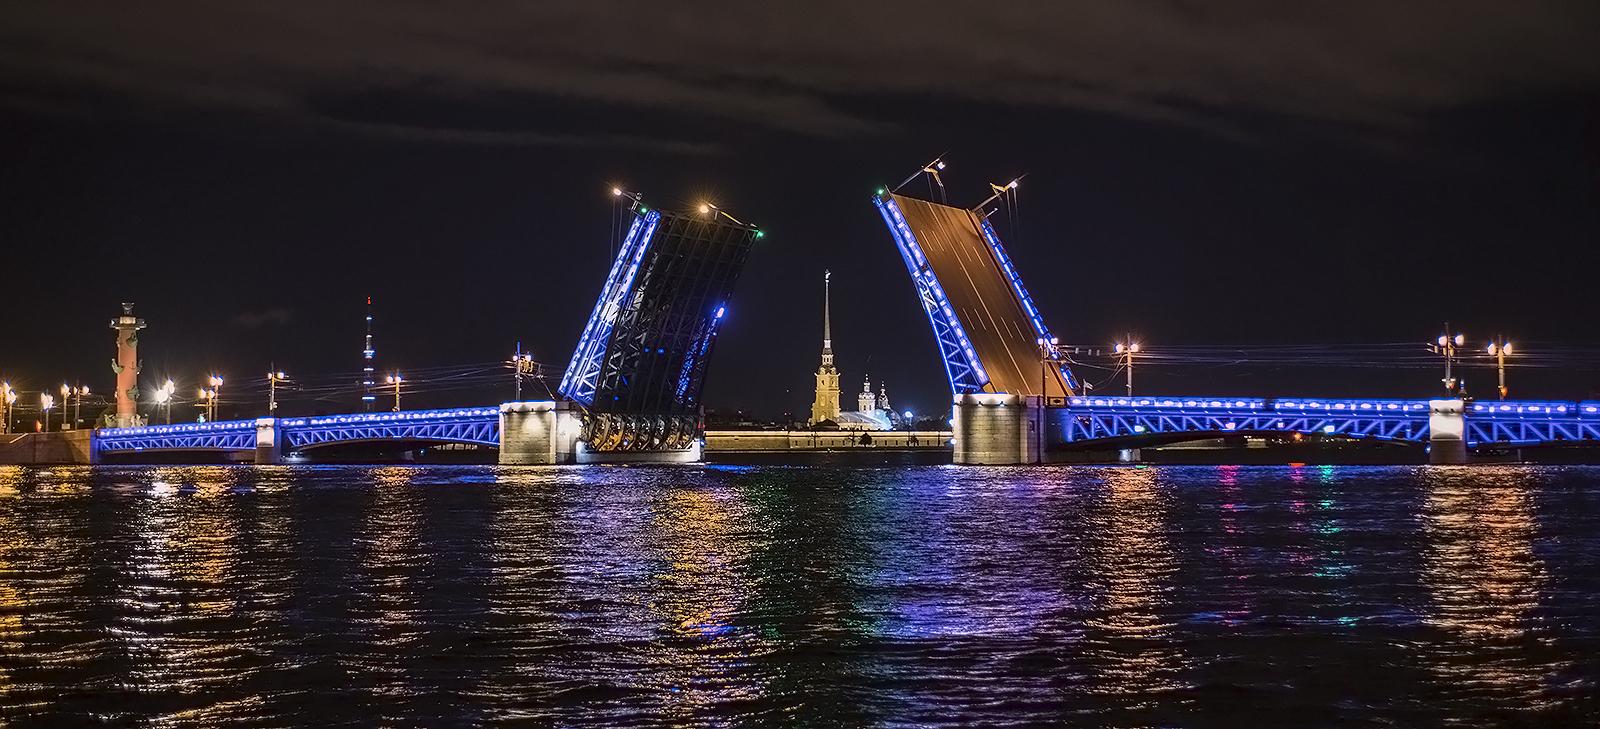 дворцовый мост питер